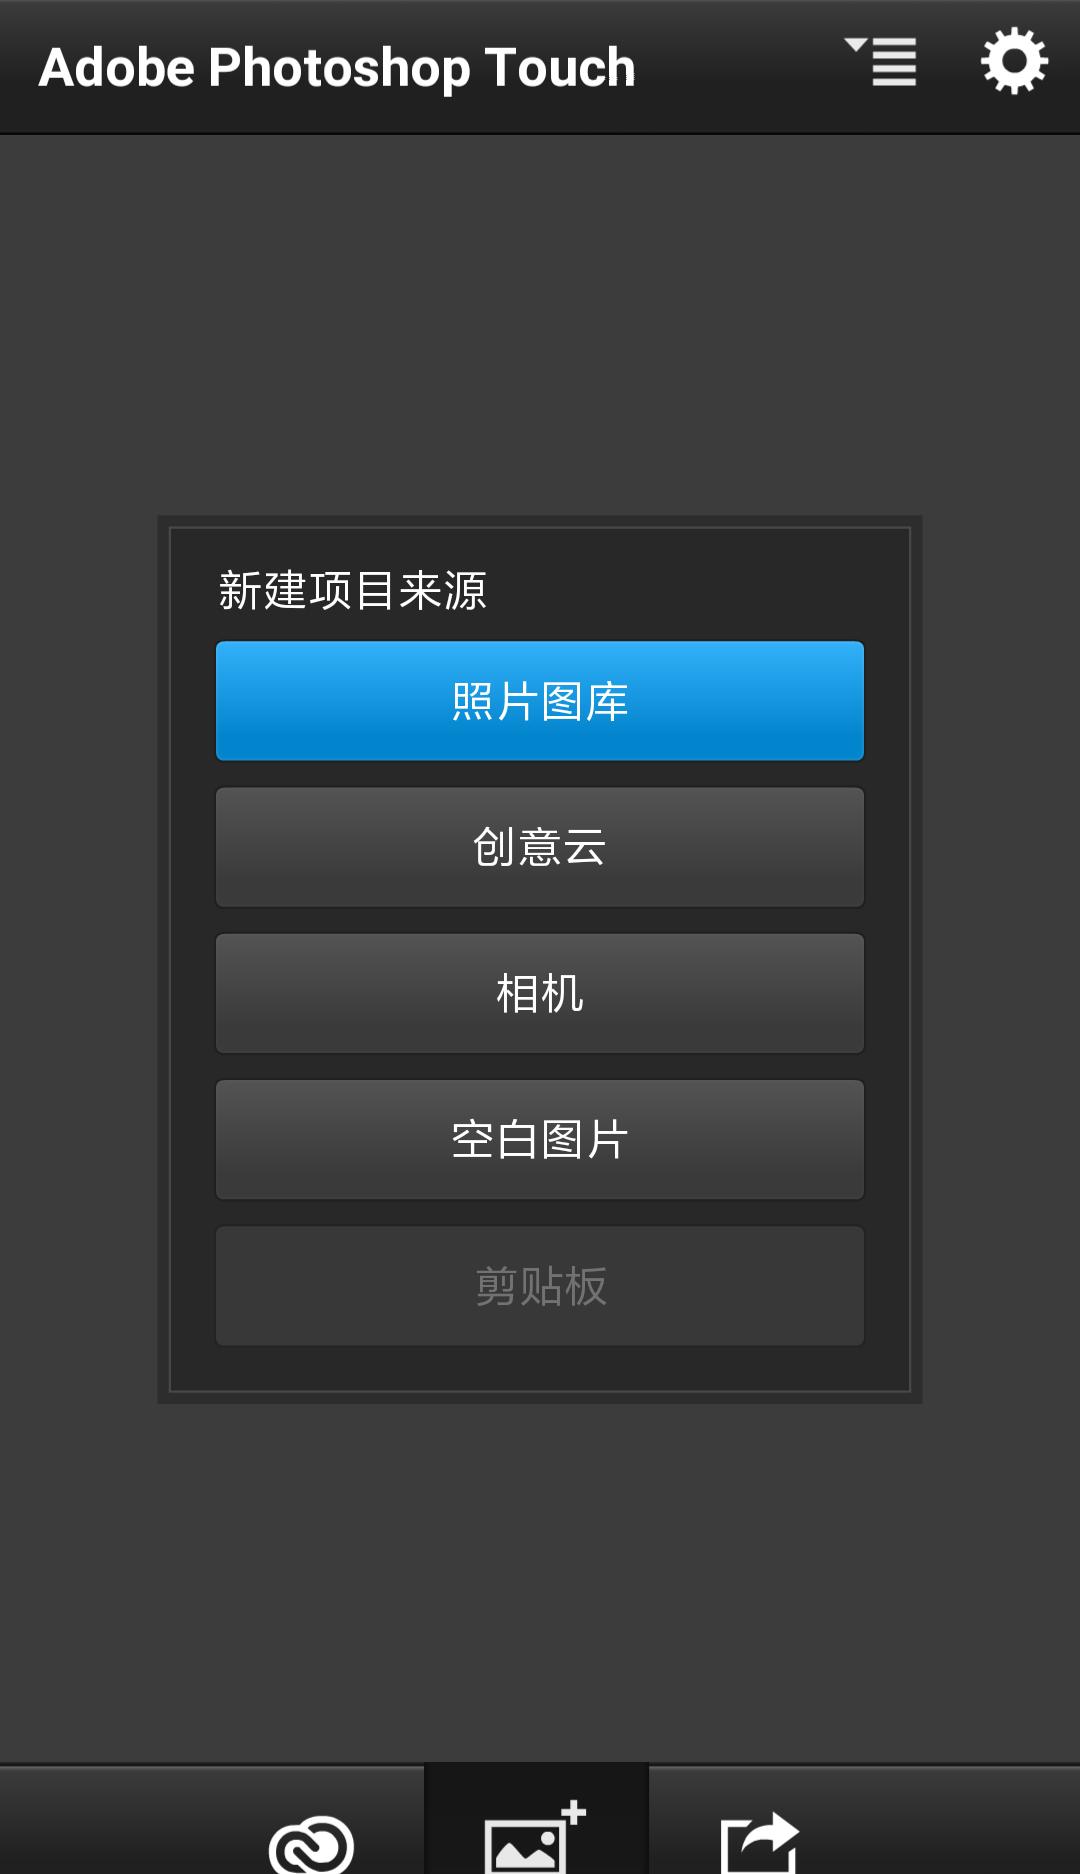 [Android] 安卓PS Touch手机汉化修改版最全合集第1张-菜鸟分享